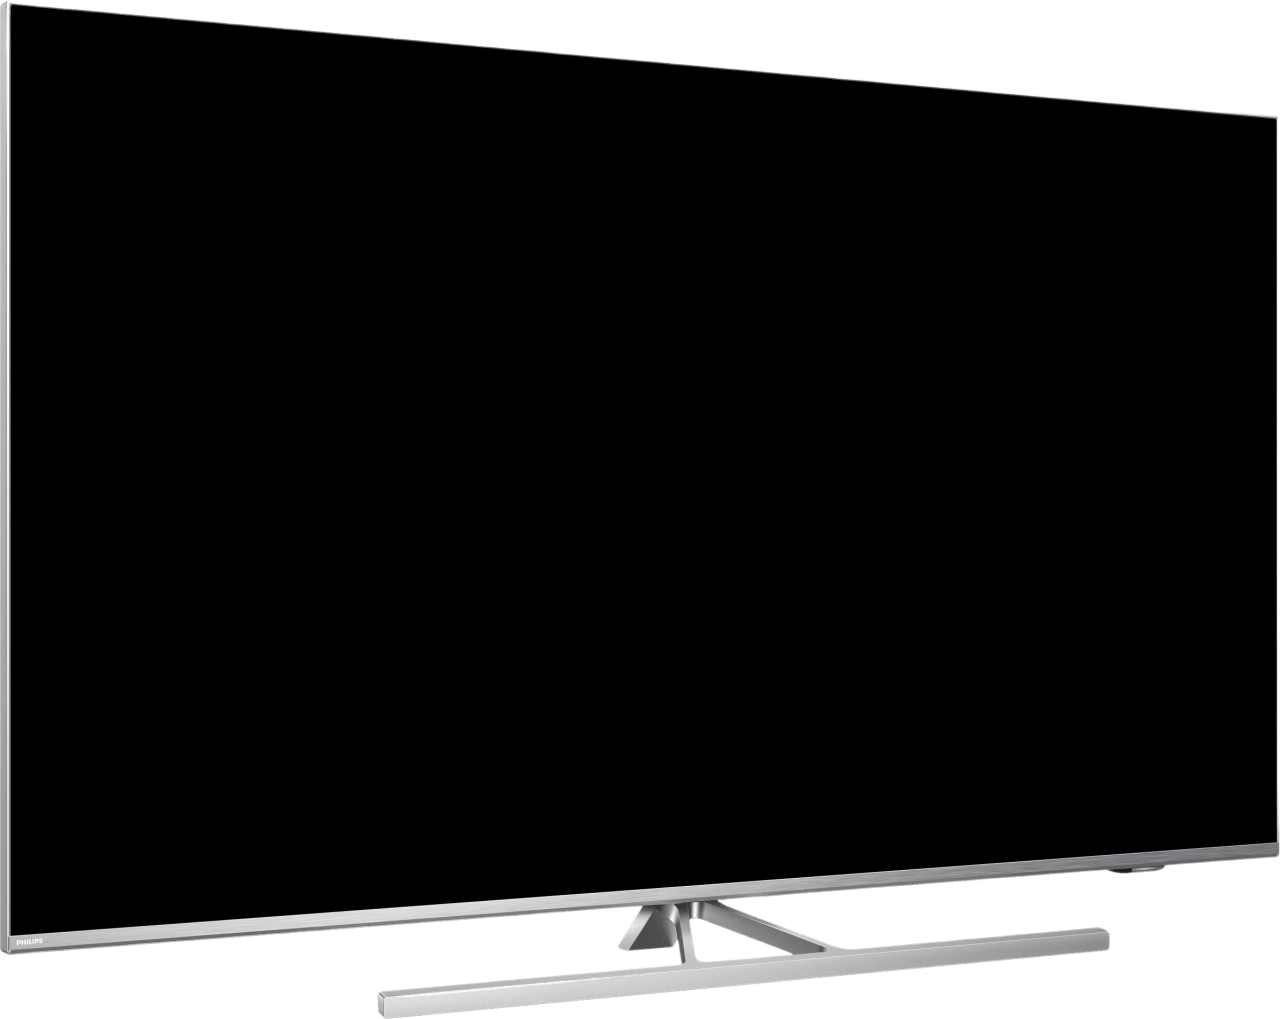 Helles Silber Philips TV 65 Zoll 65PUS8506/12 LED 4K UHD.2